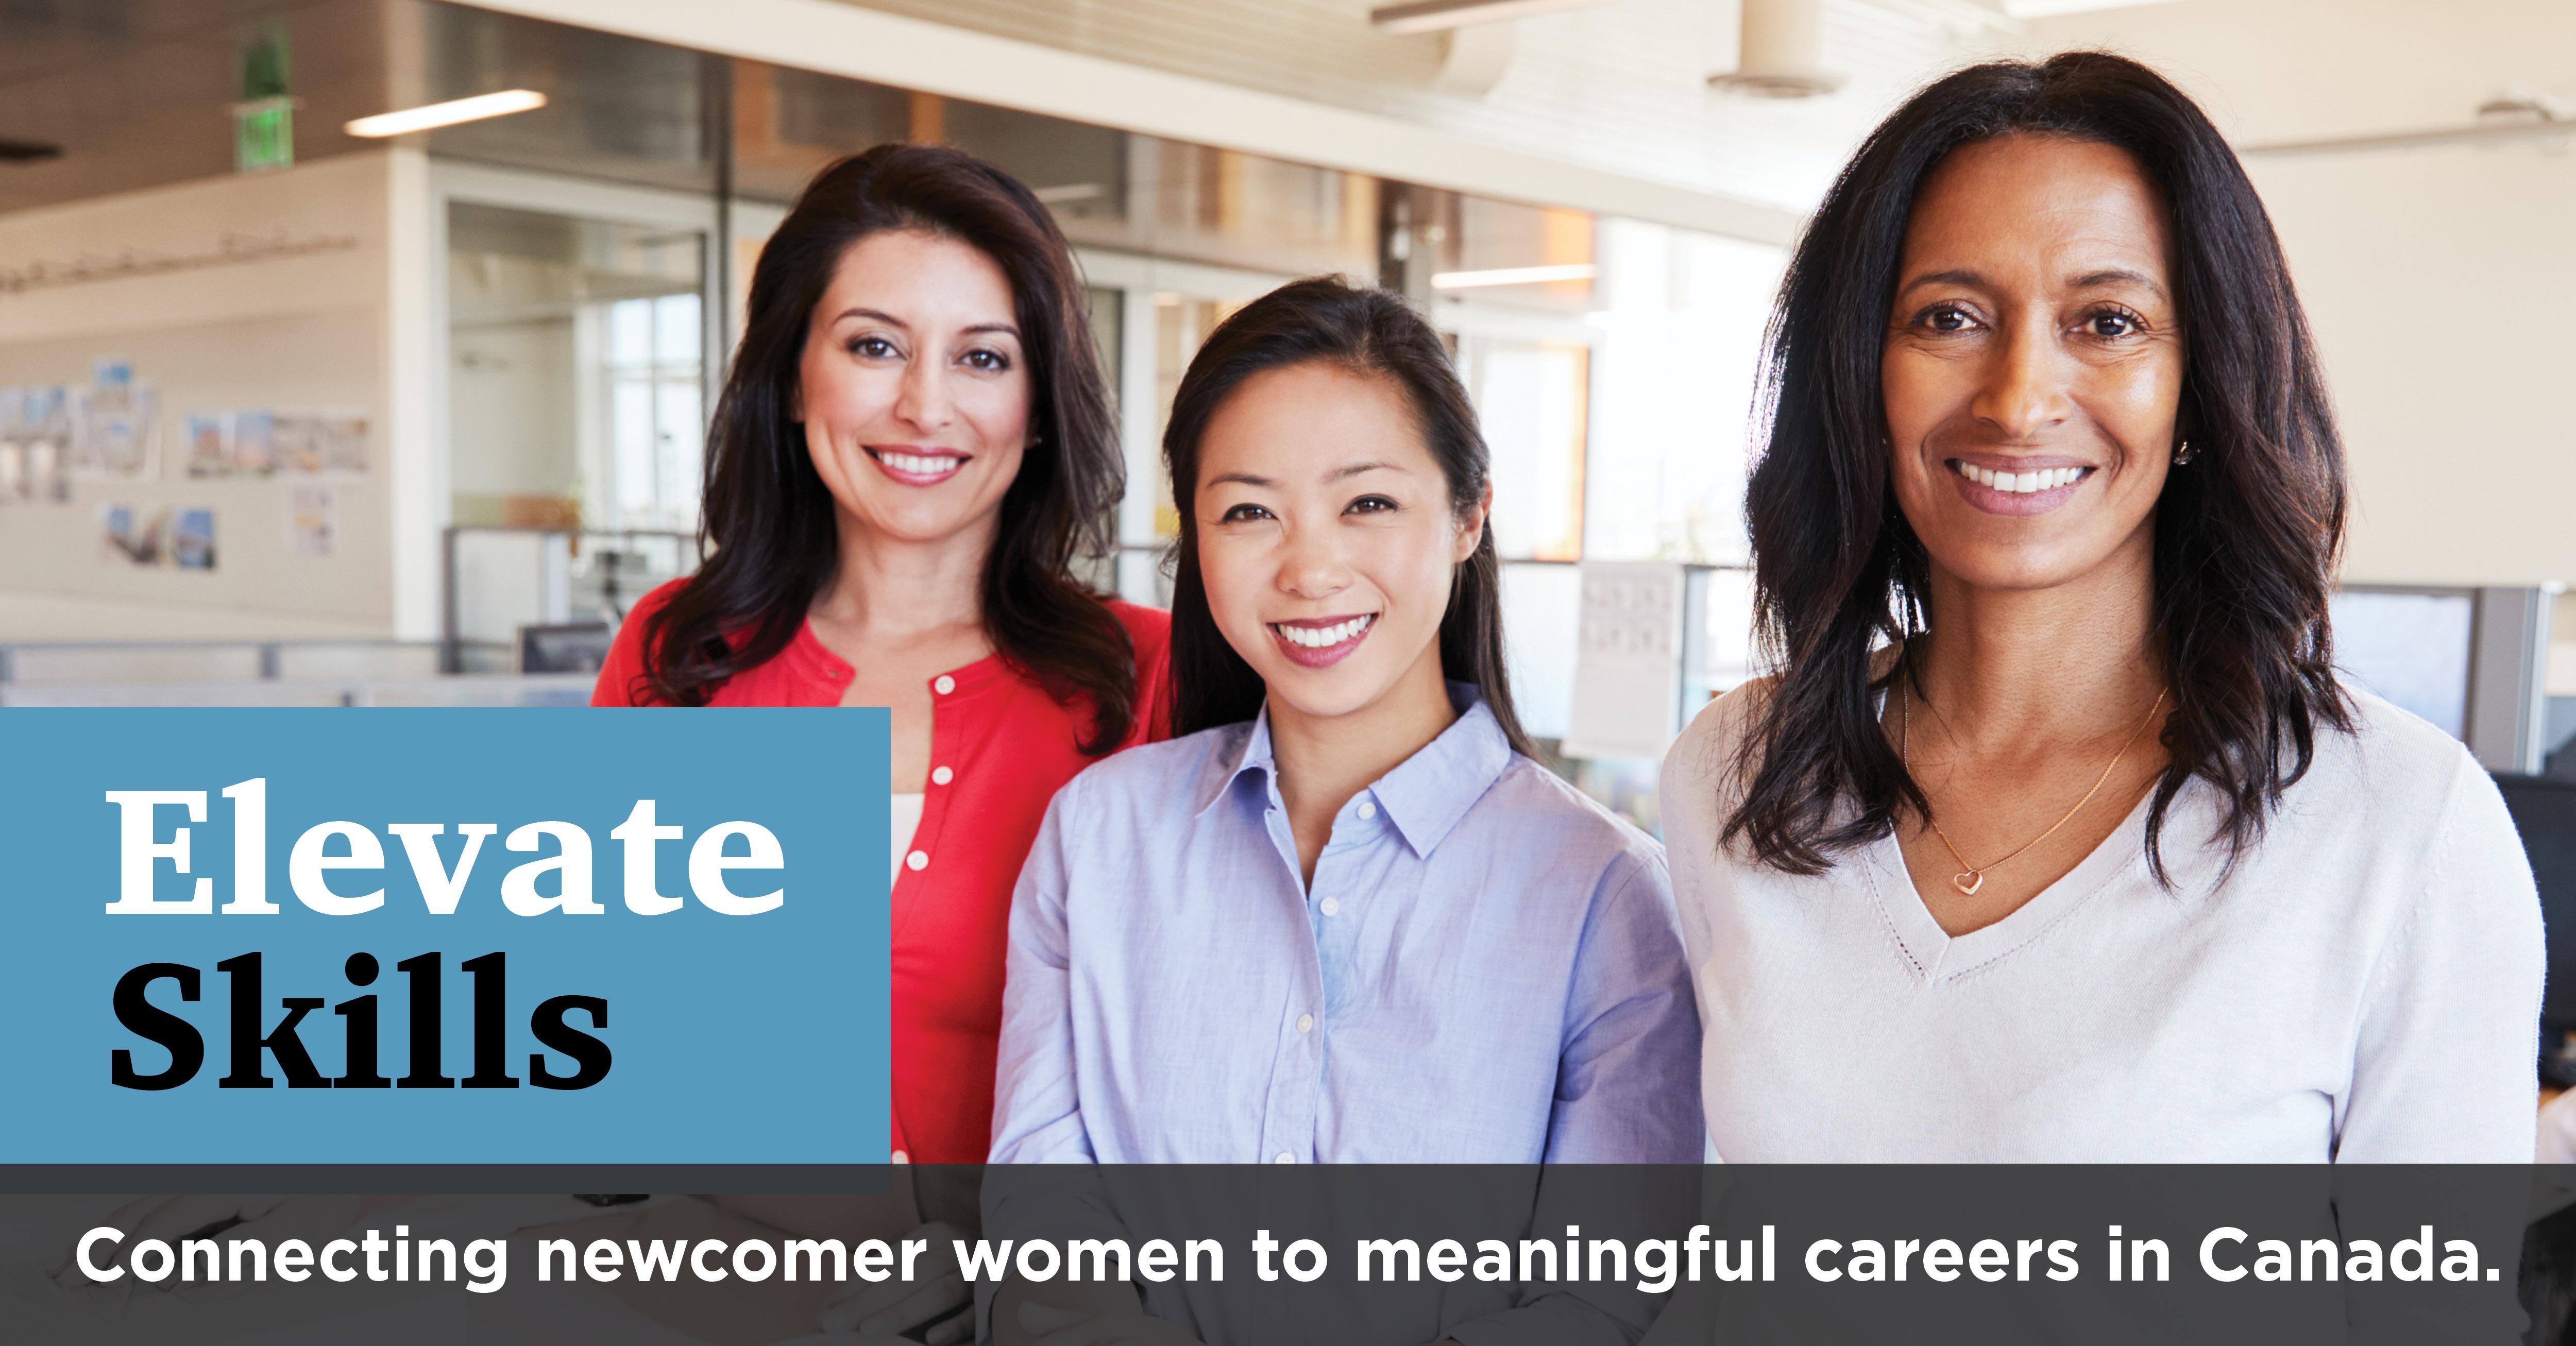 YWCA Elevate Skills | FREE Employment Program for Immigrant Women